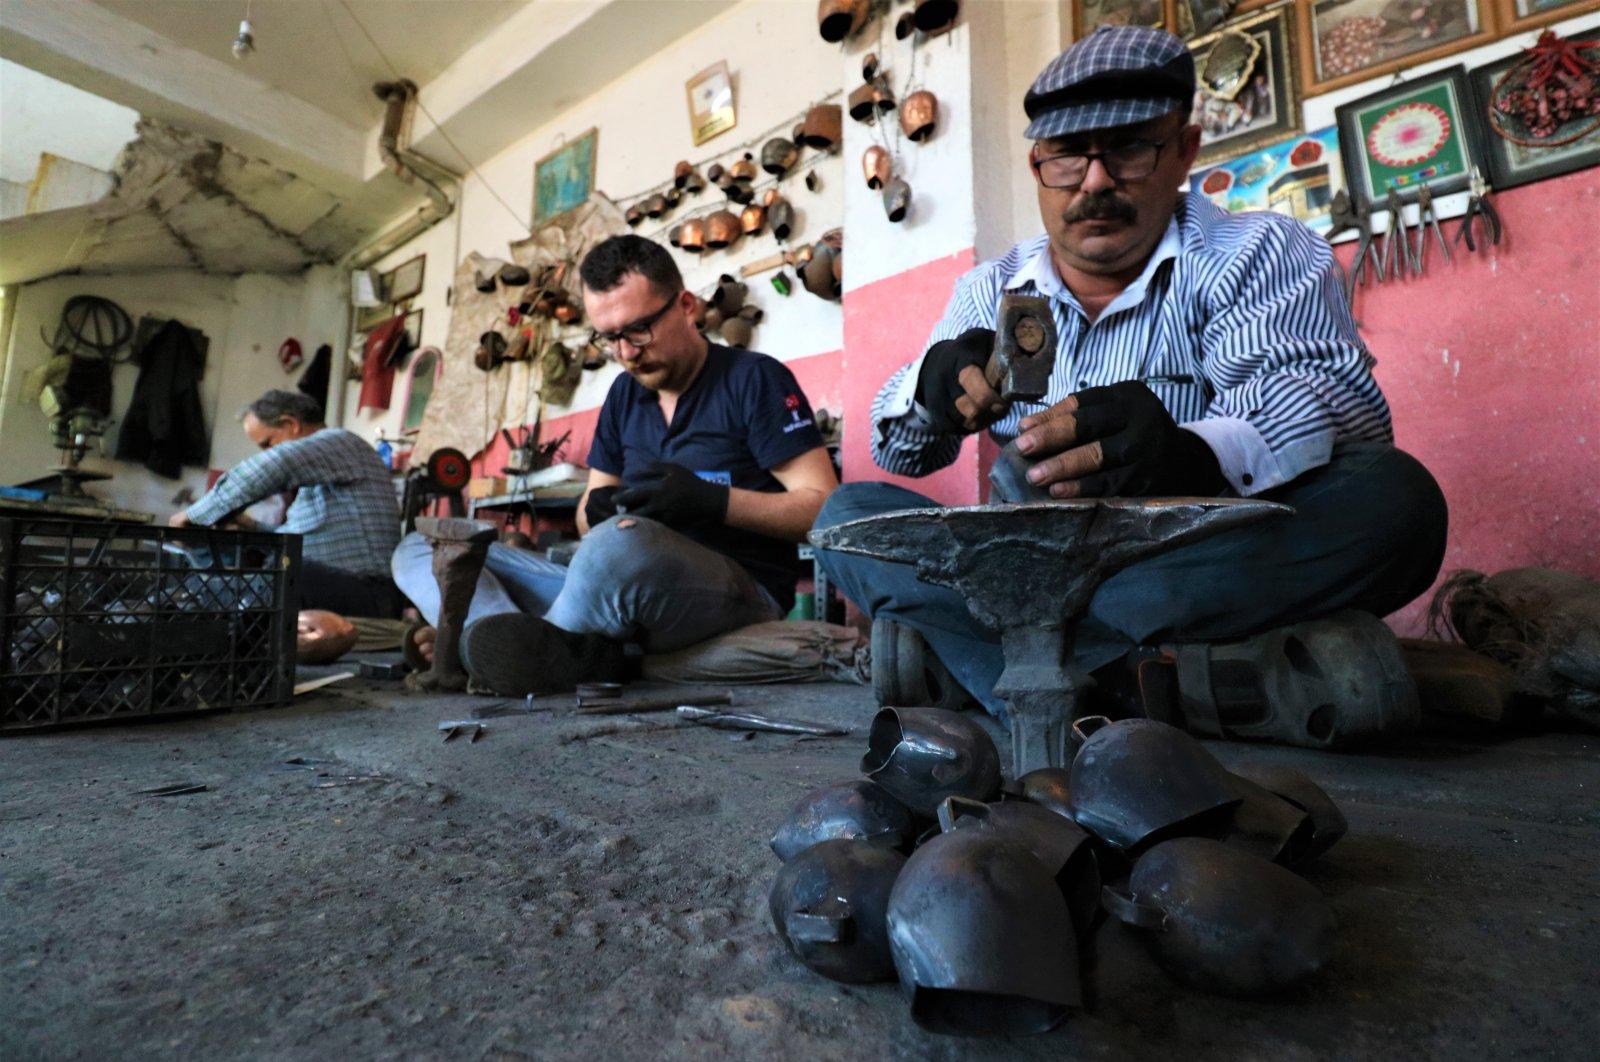 The Çancı family crafts bells in their workshop, in Manisa, Turkey, June 30, 2020. (IHA Photo)